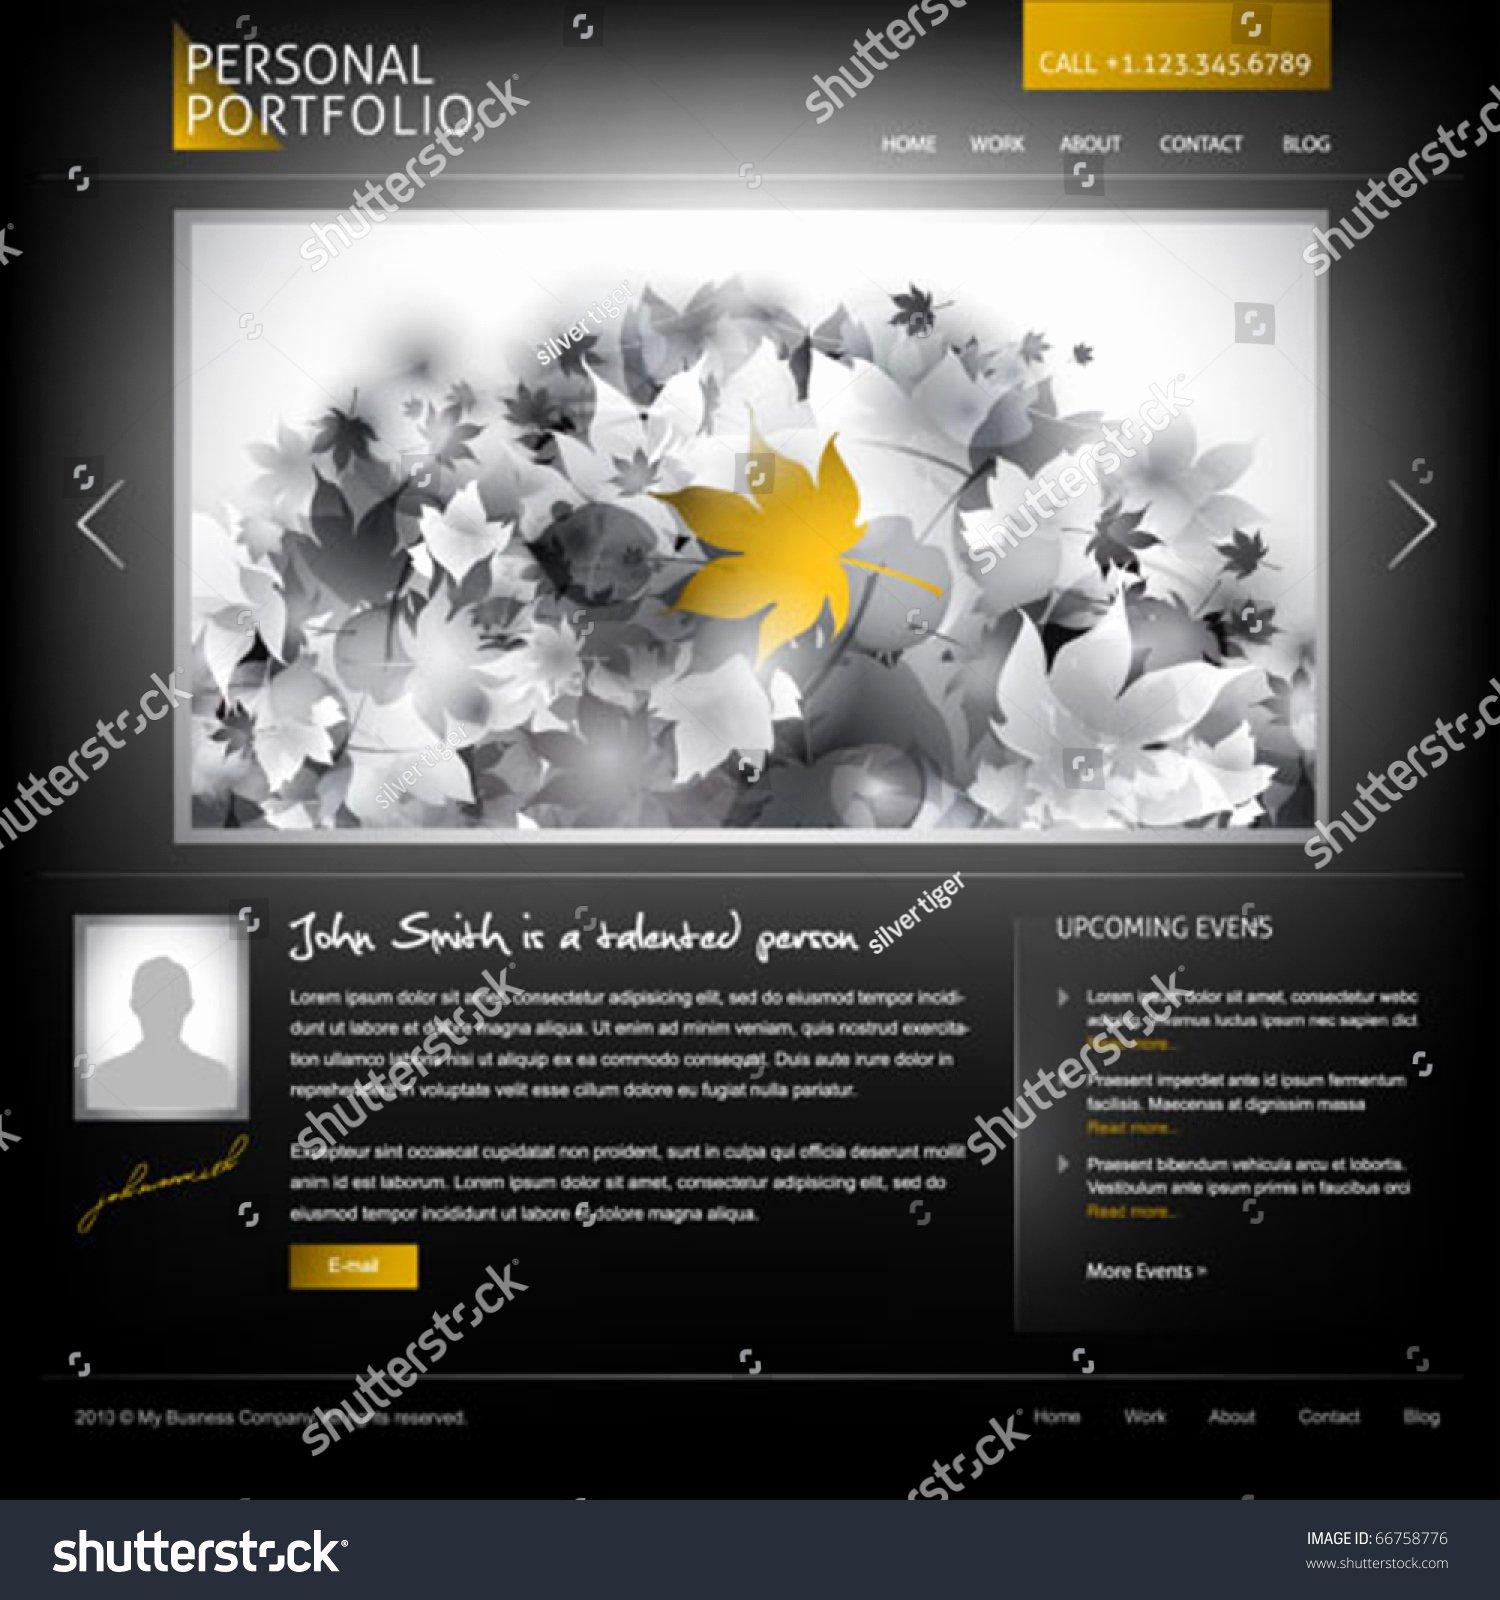 Black Stylish Website Template for Personal Portfolio